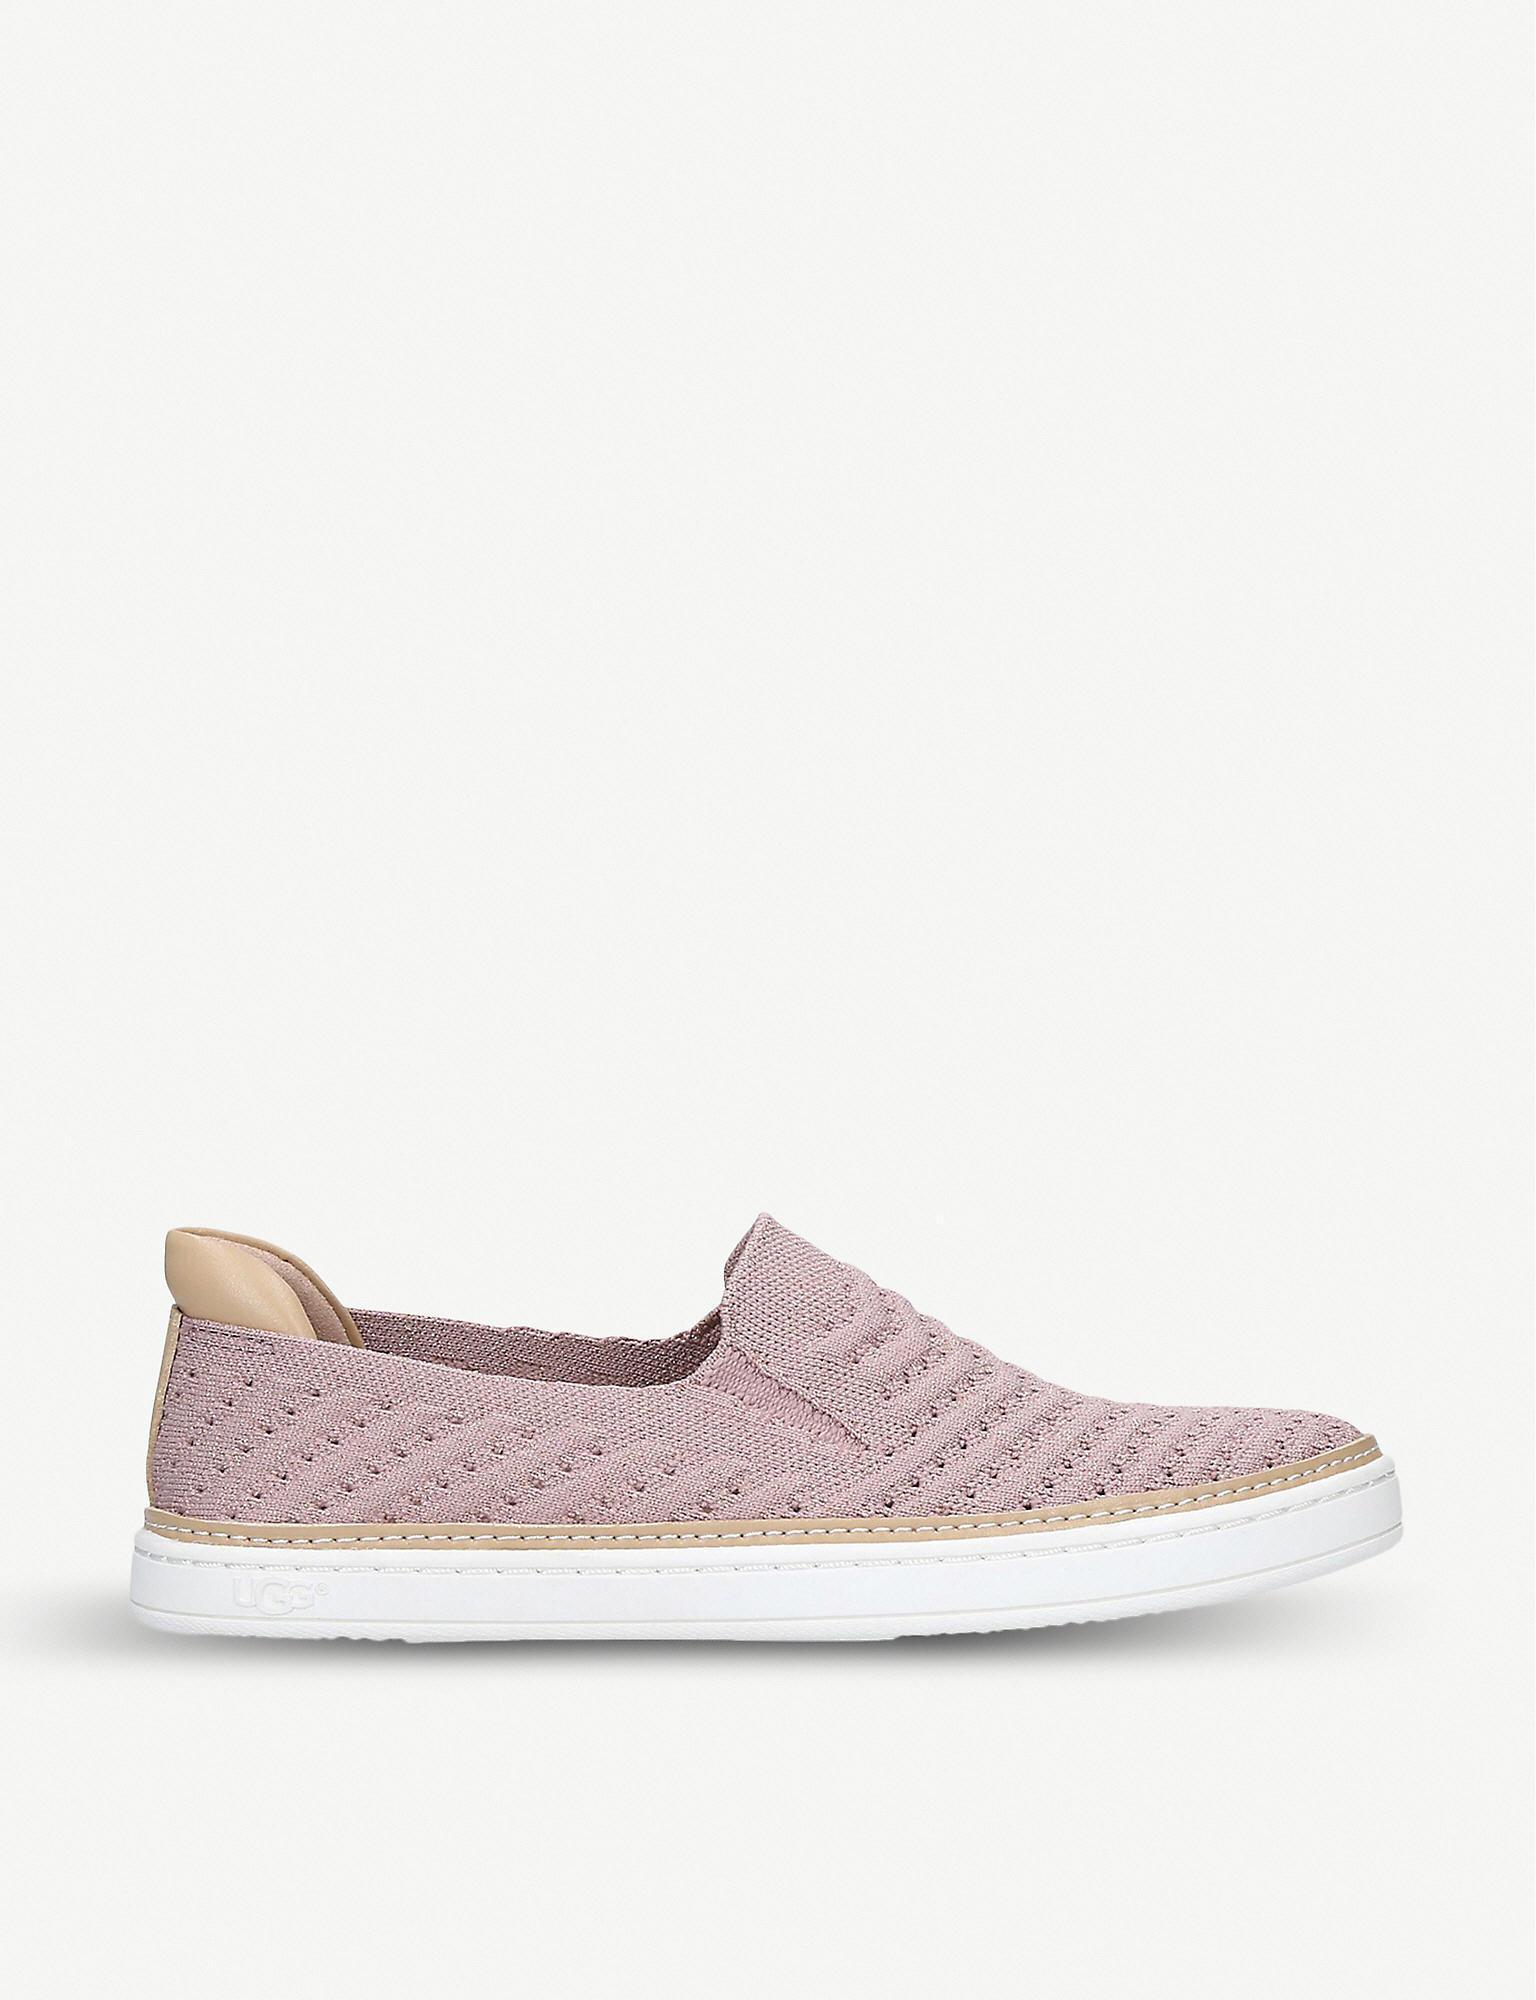 0541542c14d Ugg - Pink Sammy Chevron-knit Trainers - Lyst